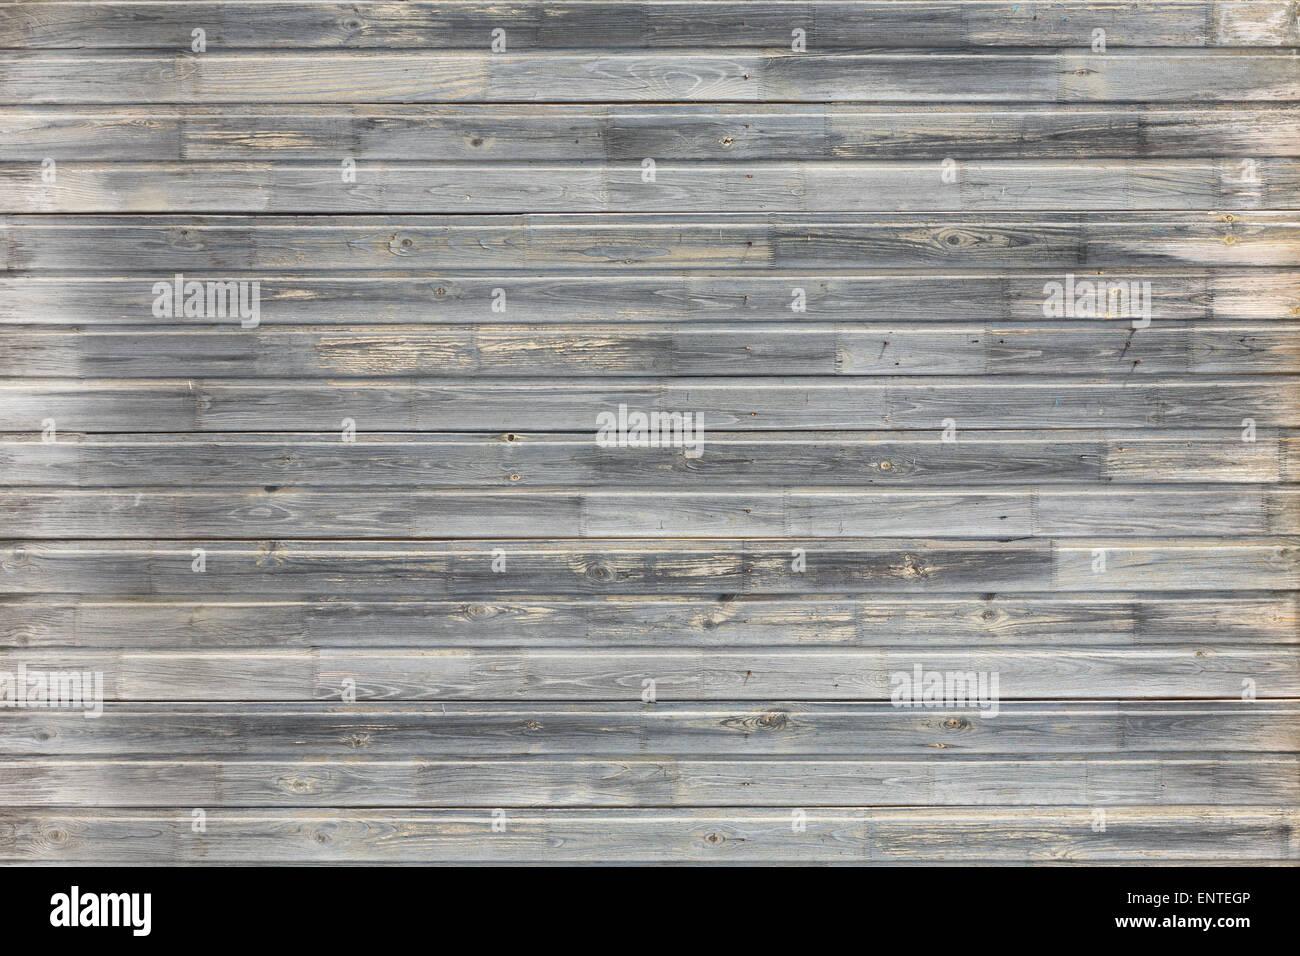 Worn wood plank stock photos